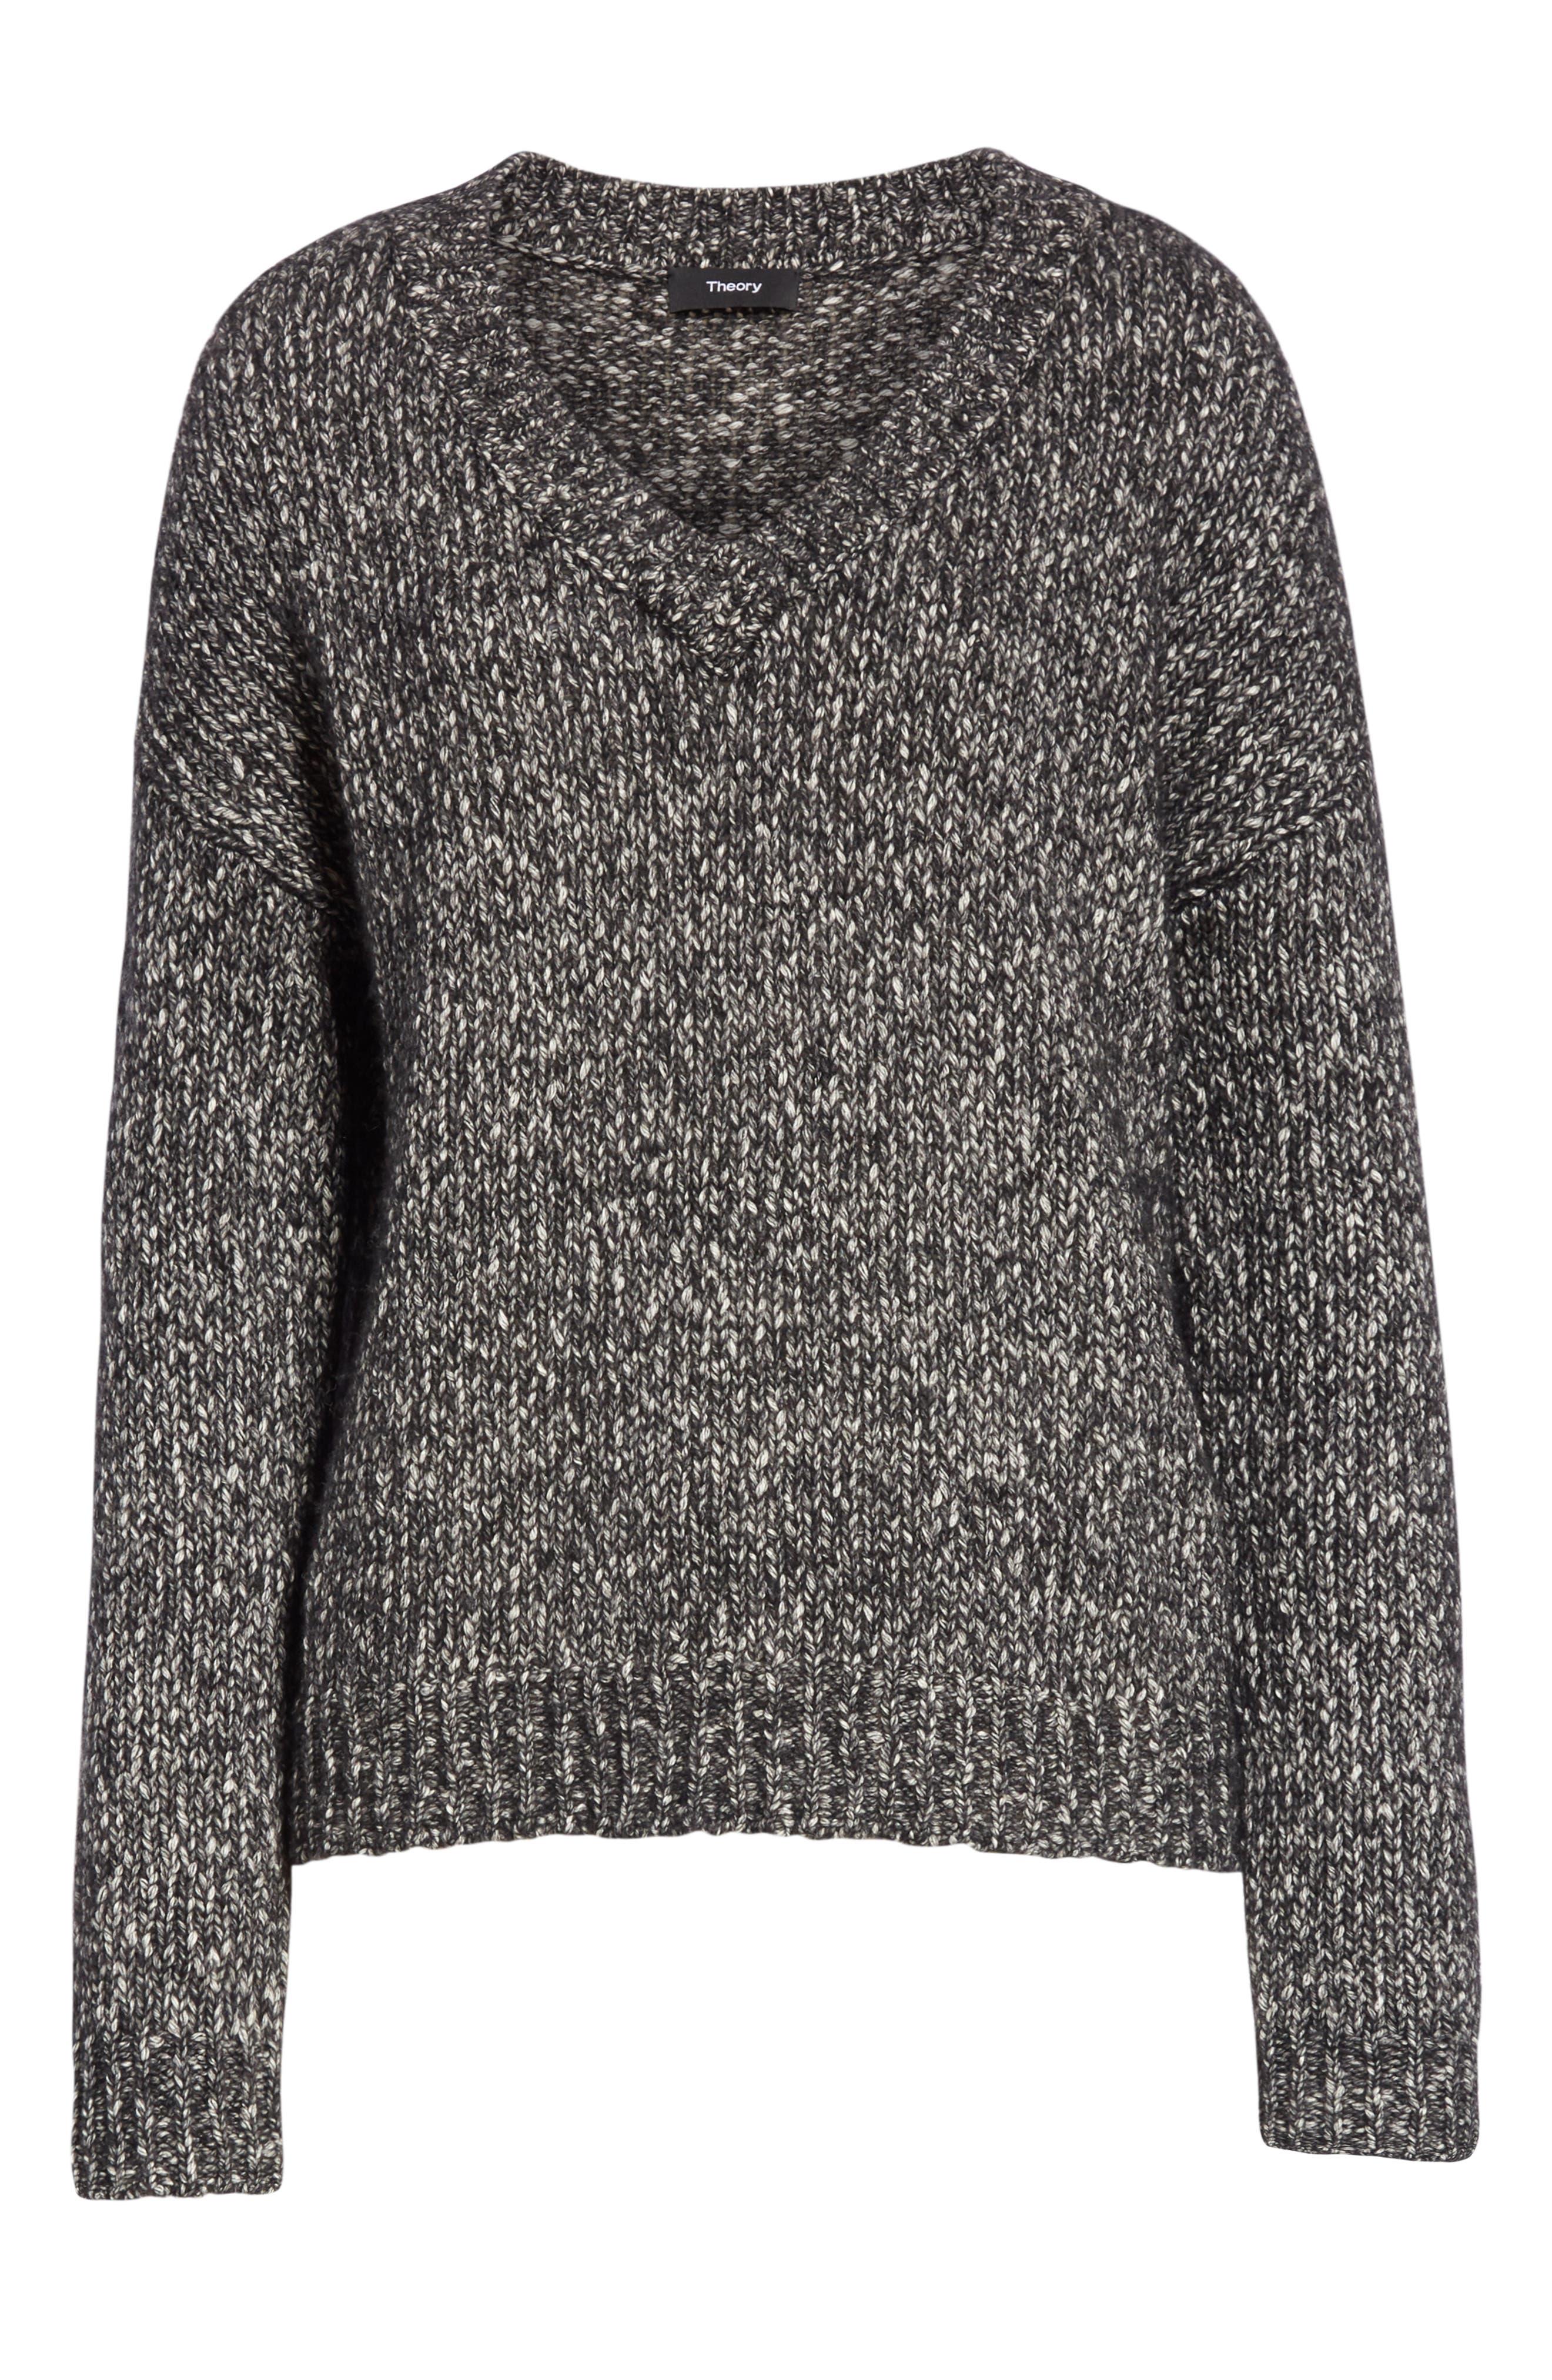 Parkland Slouchy Cotton & Wool Sweater,                             Alternate thumbnail 6, color,                             LEAD MELANGE